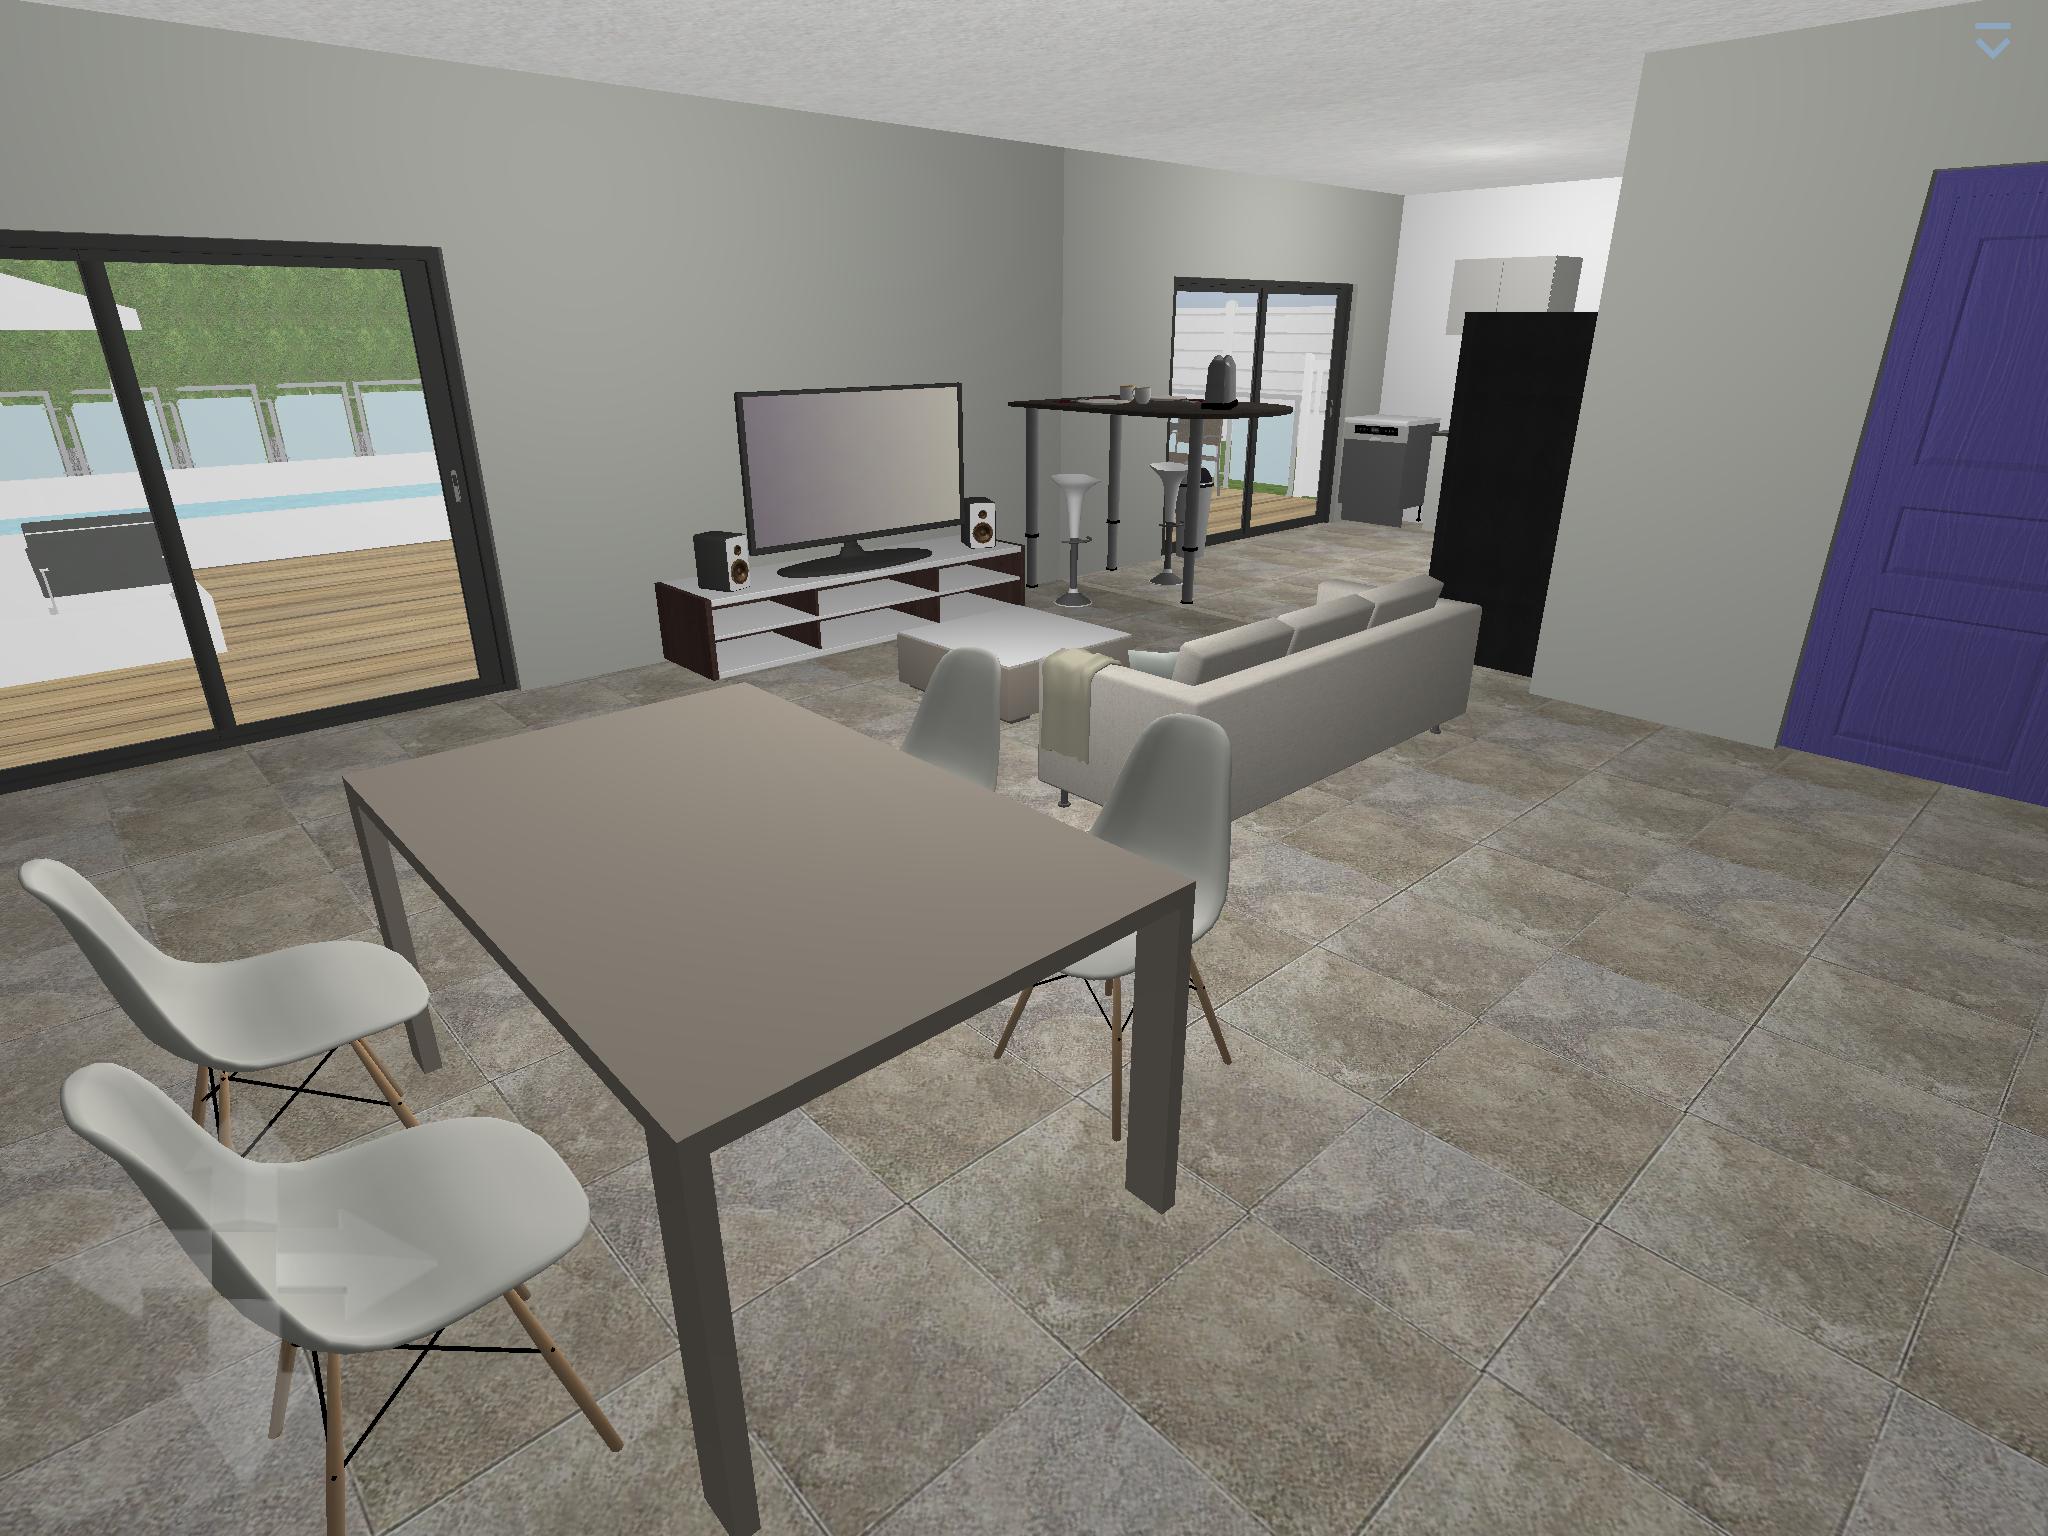 Stunning Plan D Salon Salle Manger Logiciel Home Design D Gold.